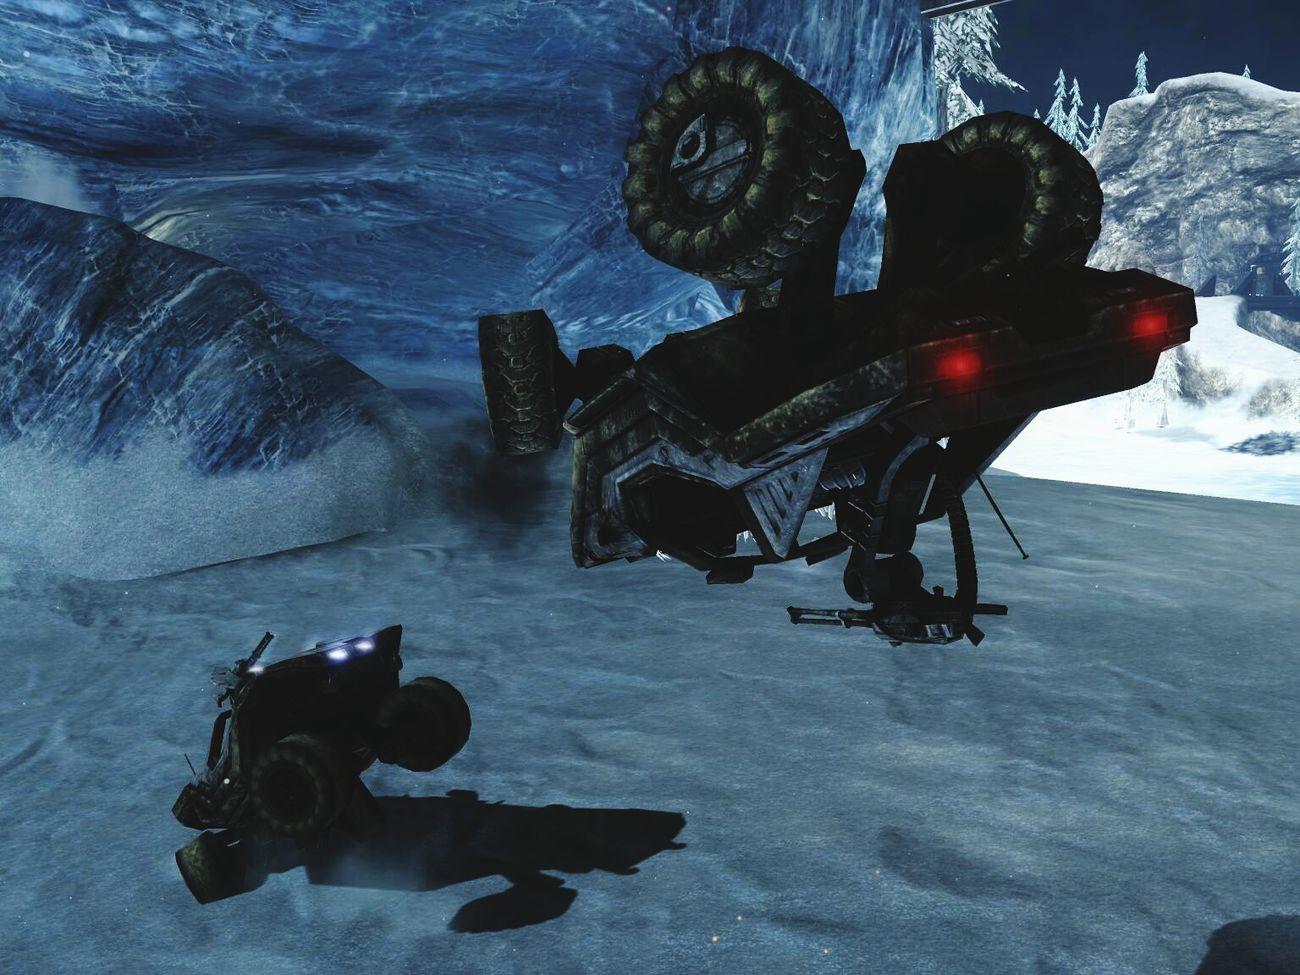 Halo3 Halo4Gameon Gamer Gamers Gamersguys Brotherlylove Gaming Ingamephotography